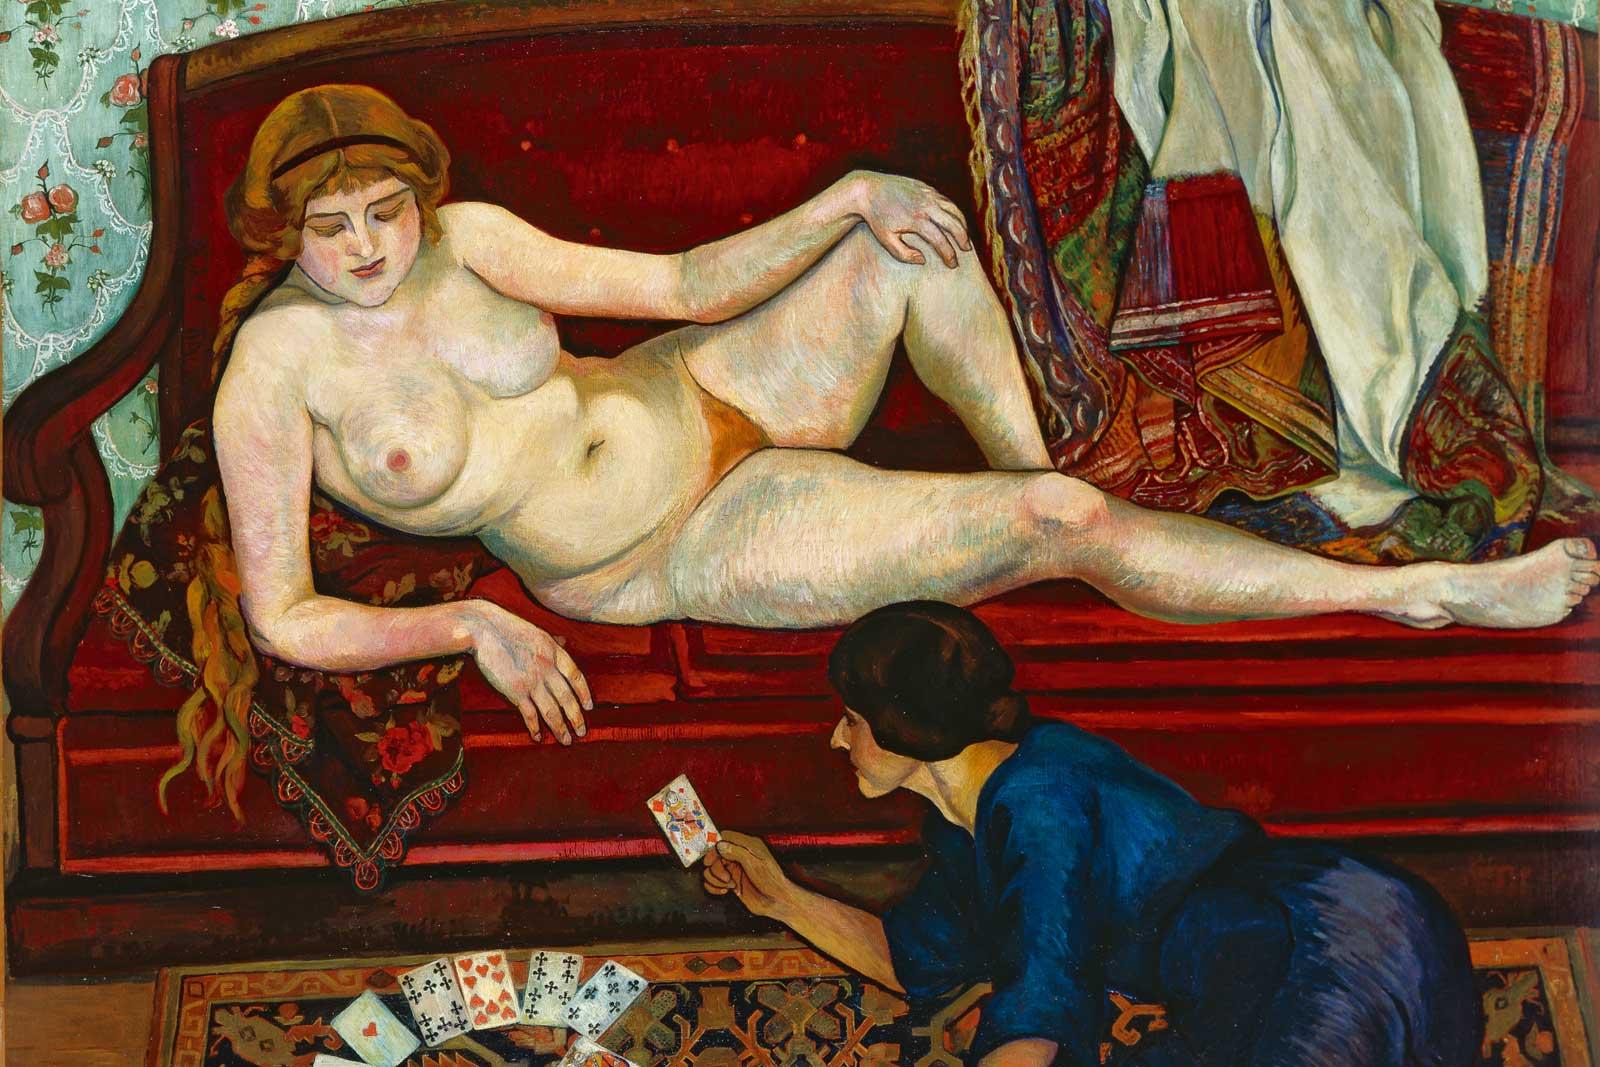 Suzanne Valadon, La Tireuse de cartes